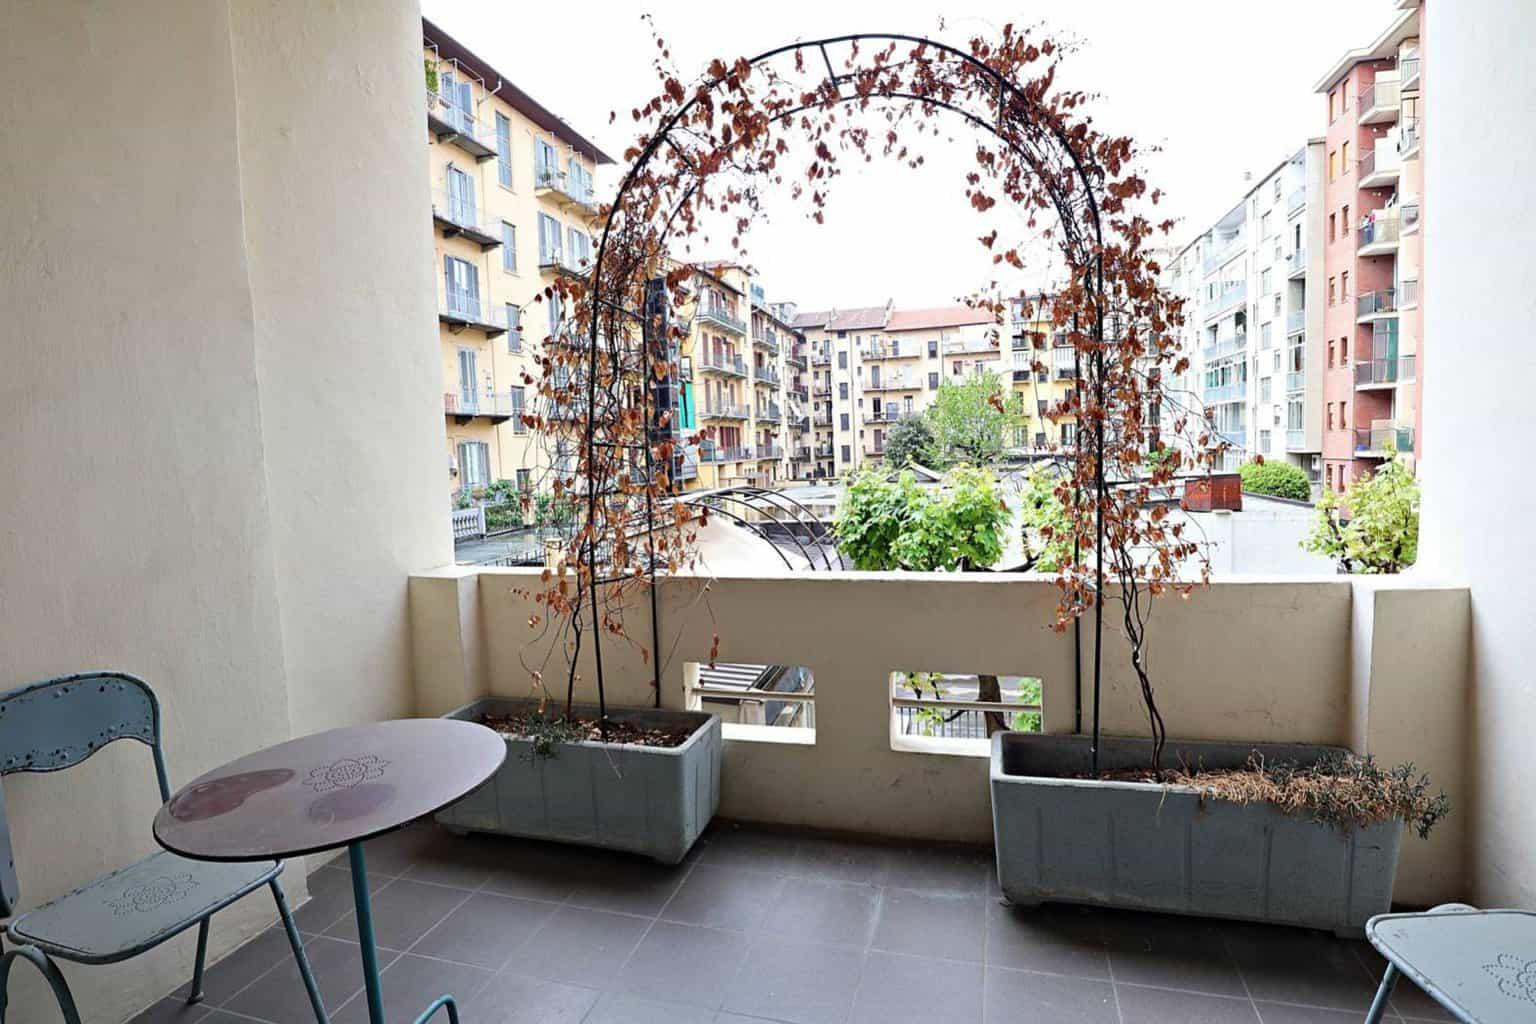 Via Caboto n.47 – Torino Crocetta